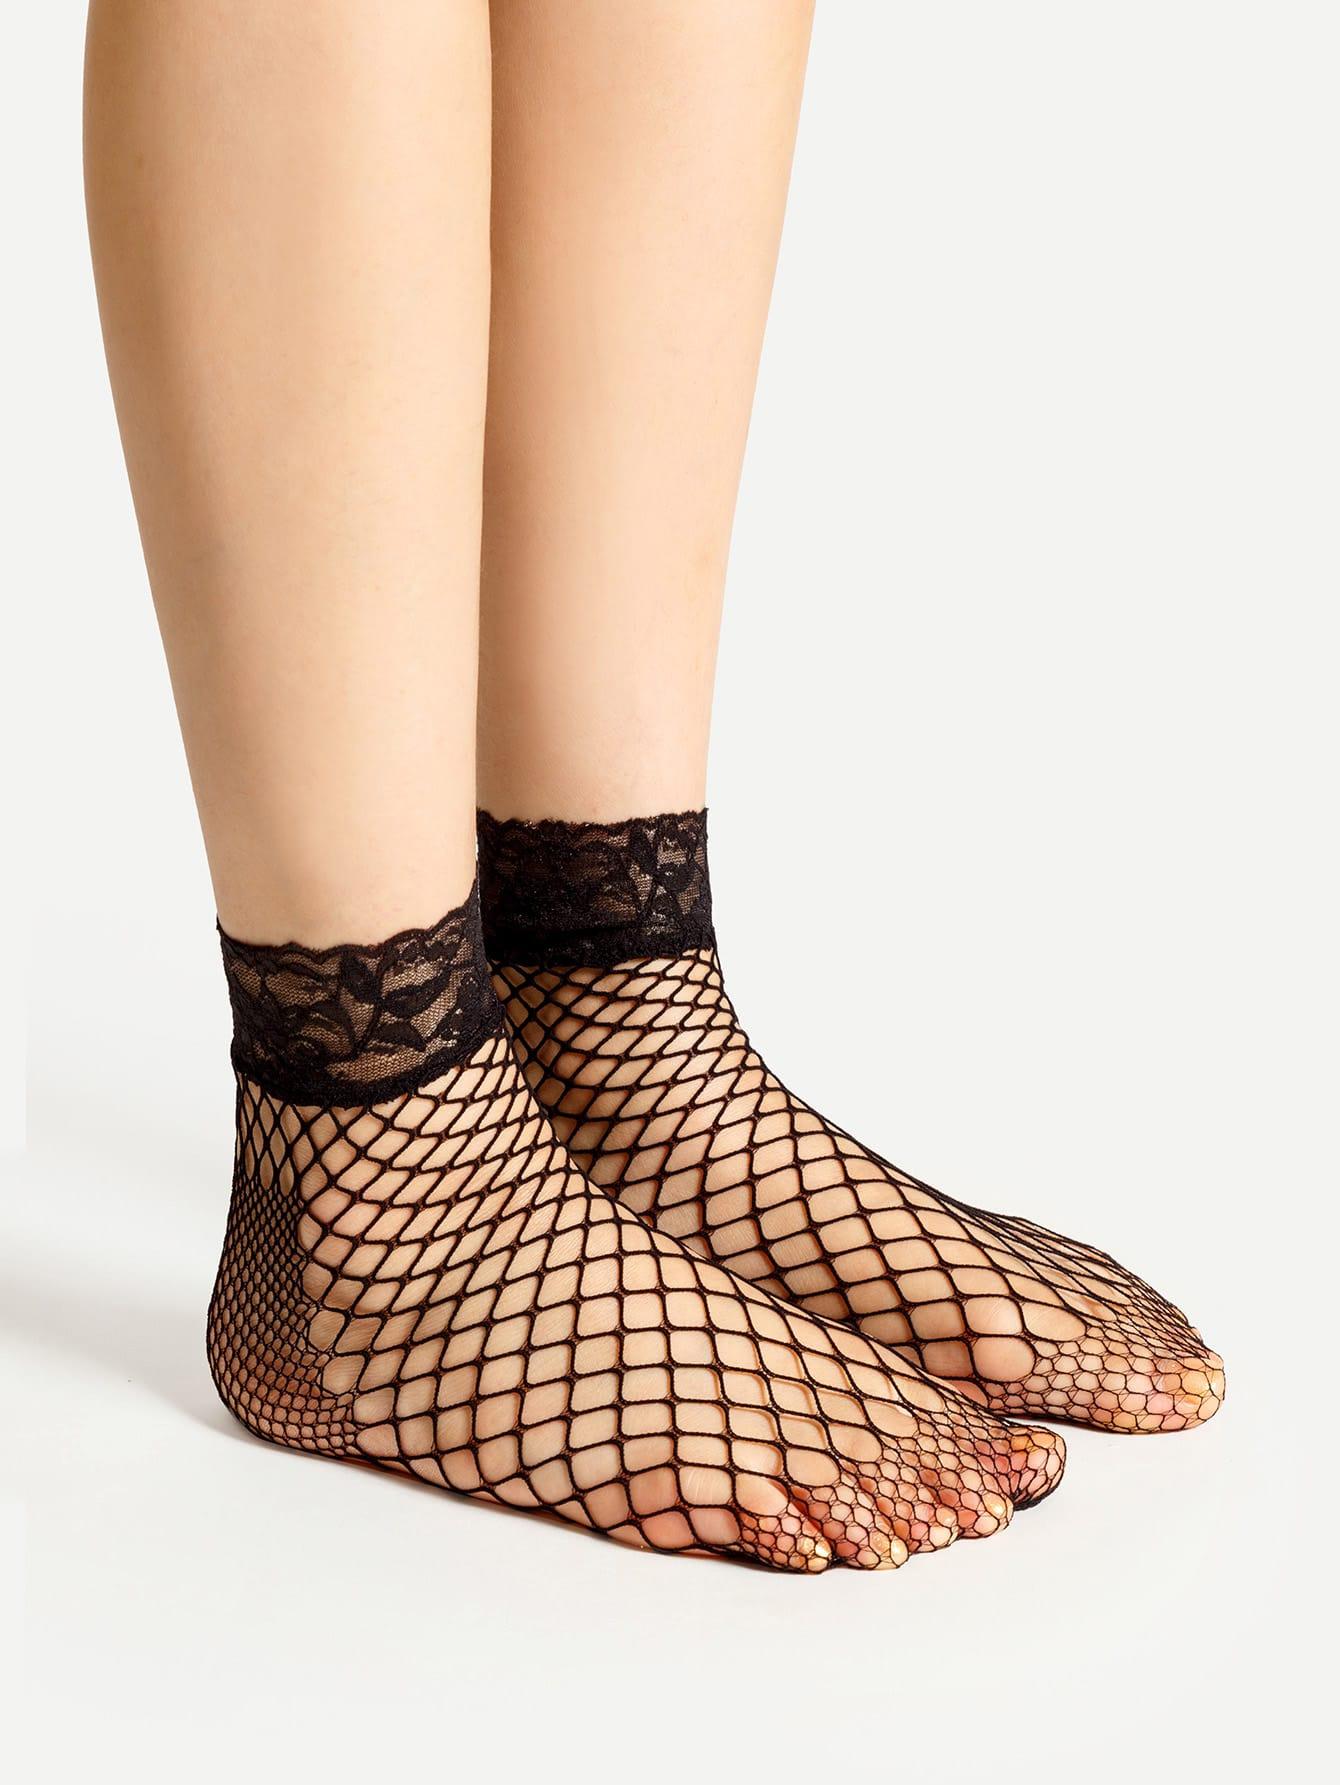 Lace Trim Fishnet Ankle Socks 4 Pairs